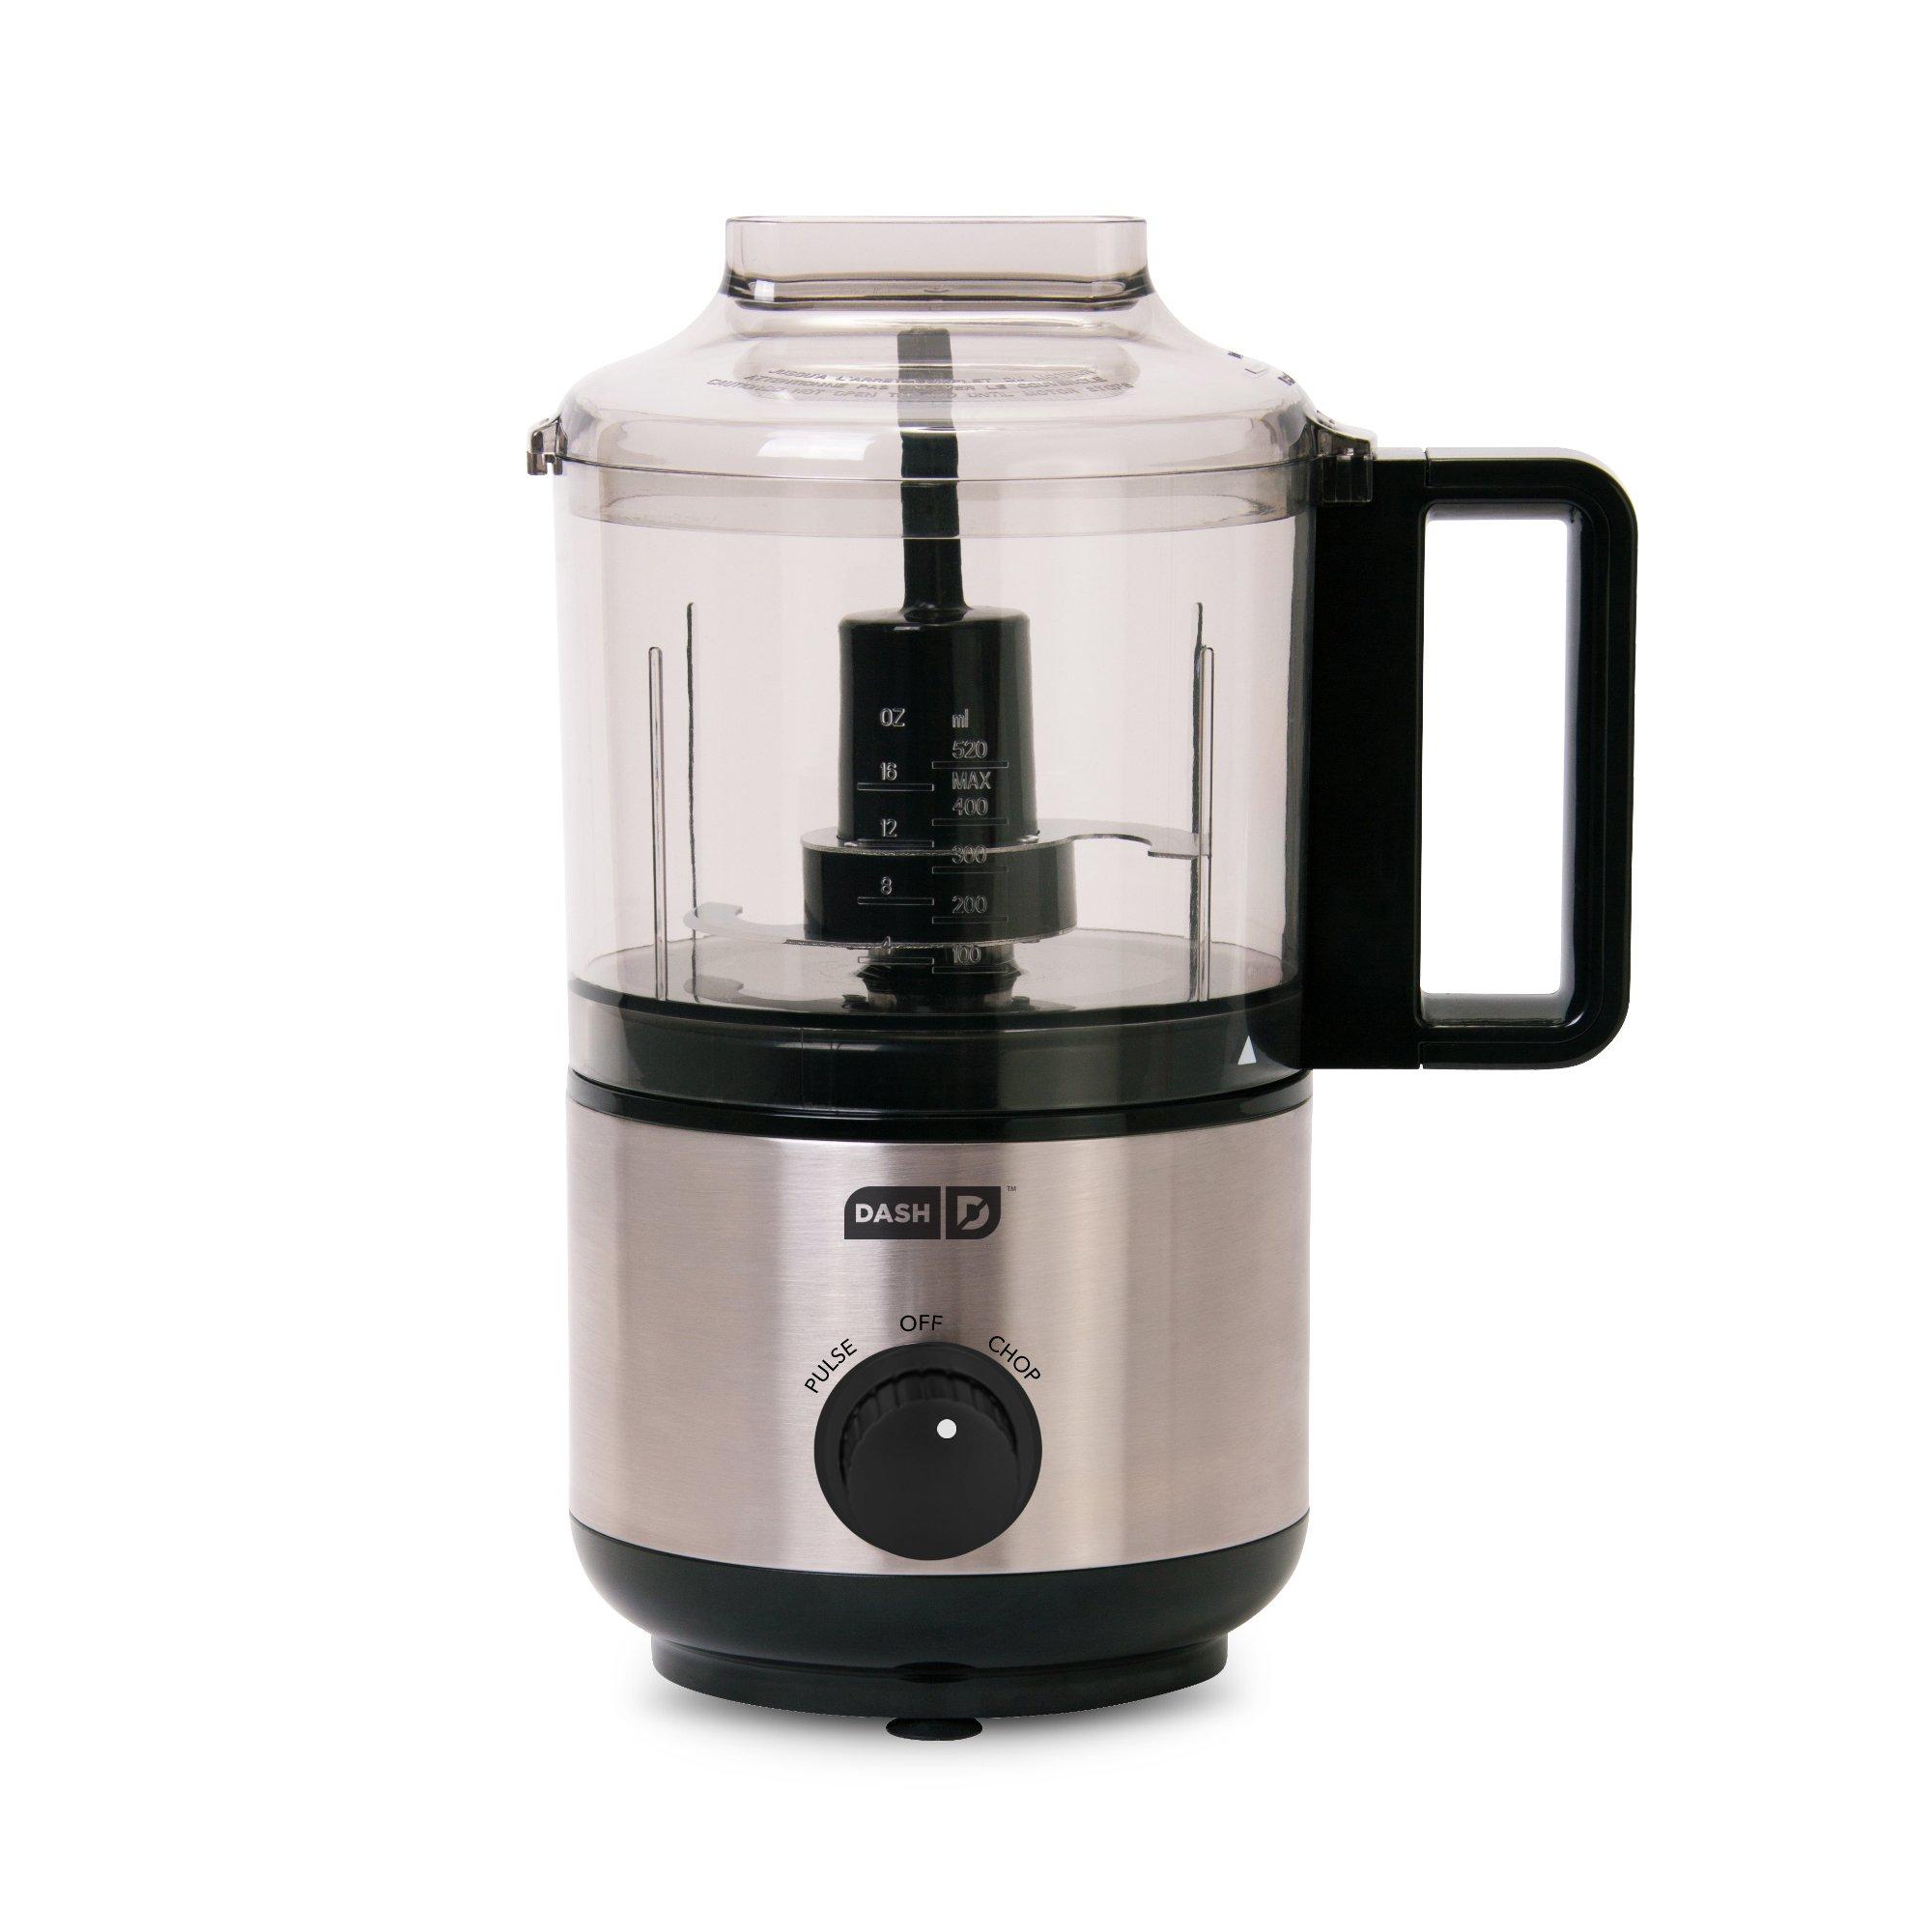 Dash DMFP100BK Express Mini Food Chopper Blend/Chop and Easy to Clean, 2 Cup, Black